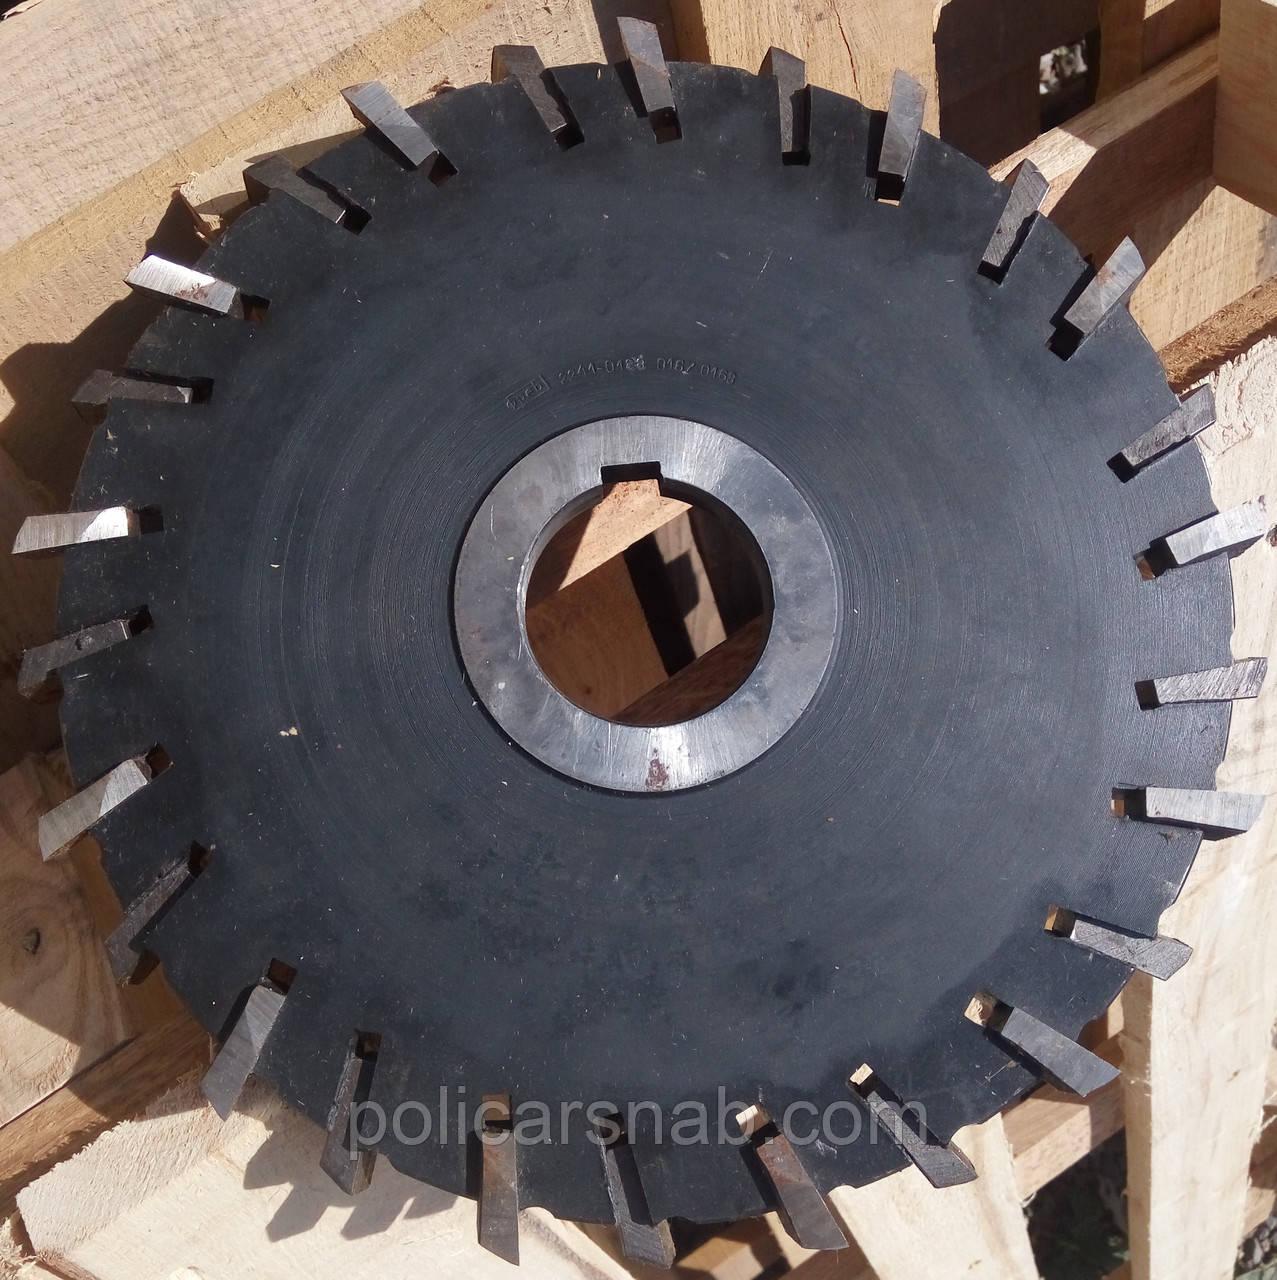 Фреза дисковая 3-х сторонняя 250х18х50 со вставными ножами - ТОВ «ПОЛІКАРСНАБ» в Житомире